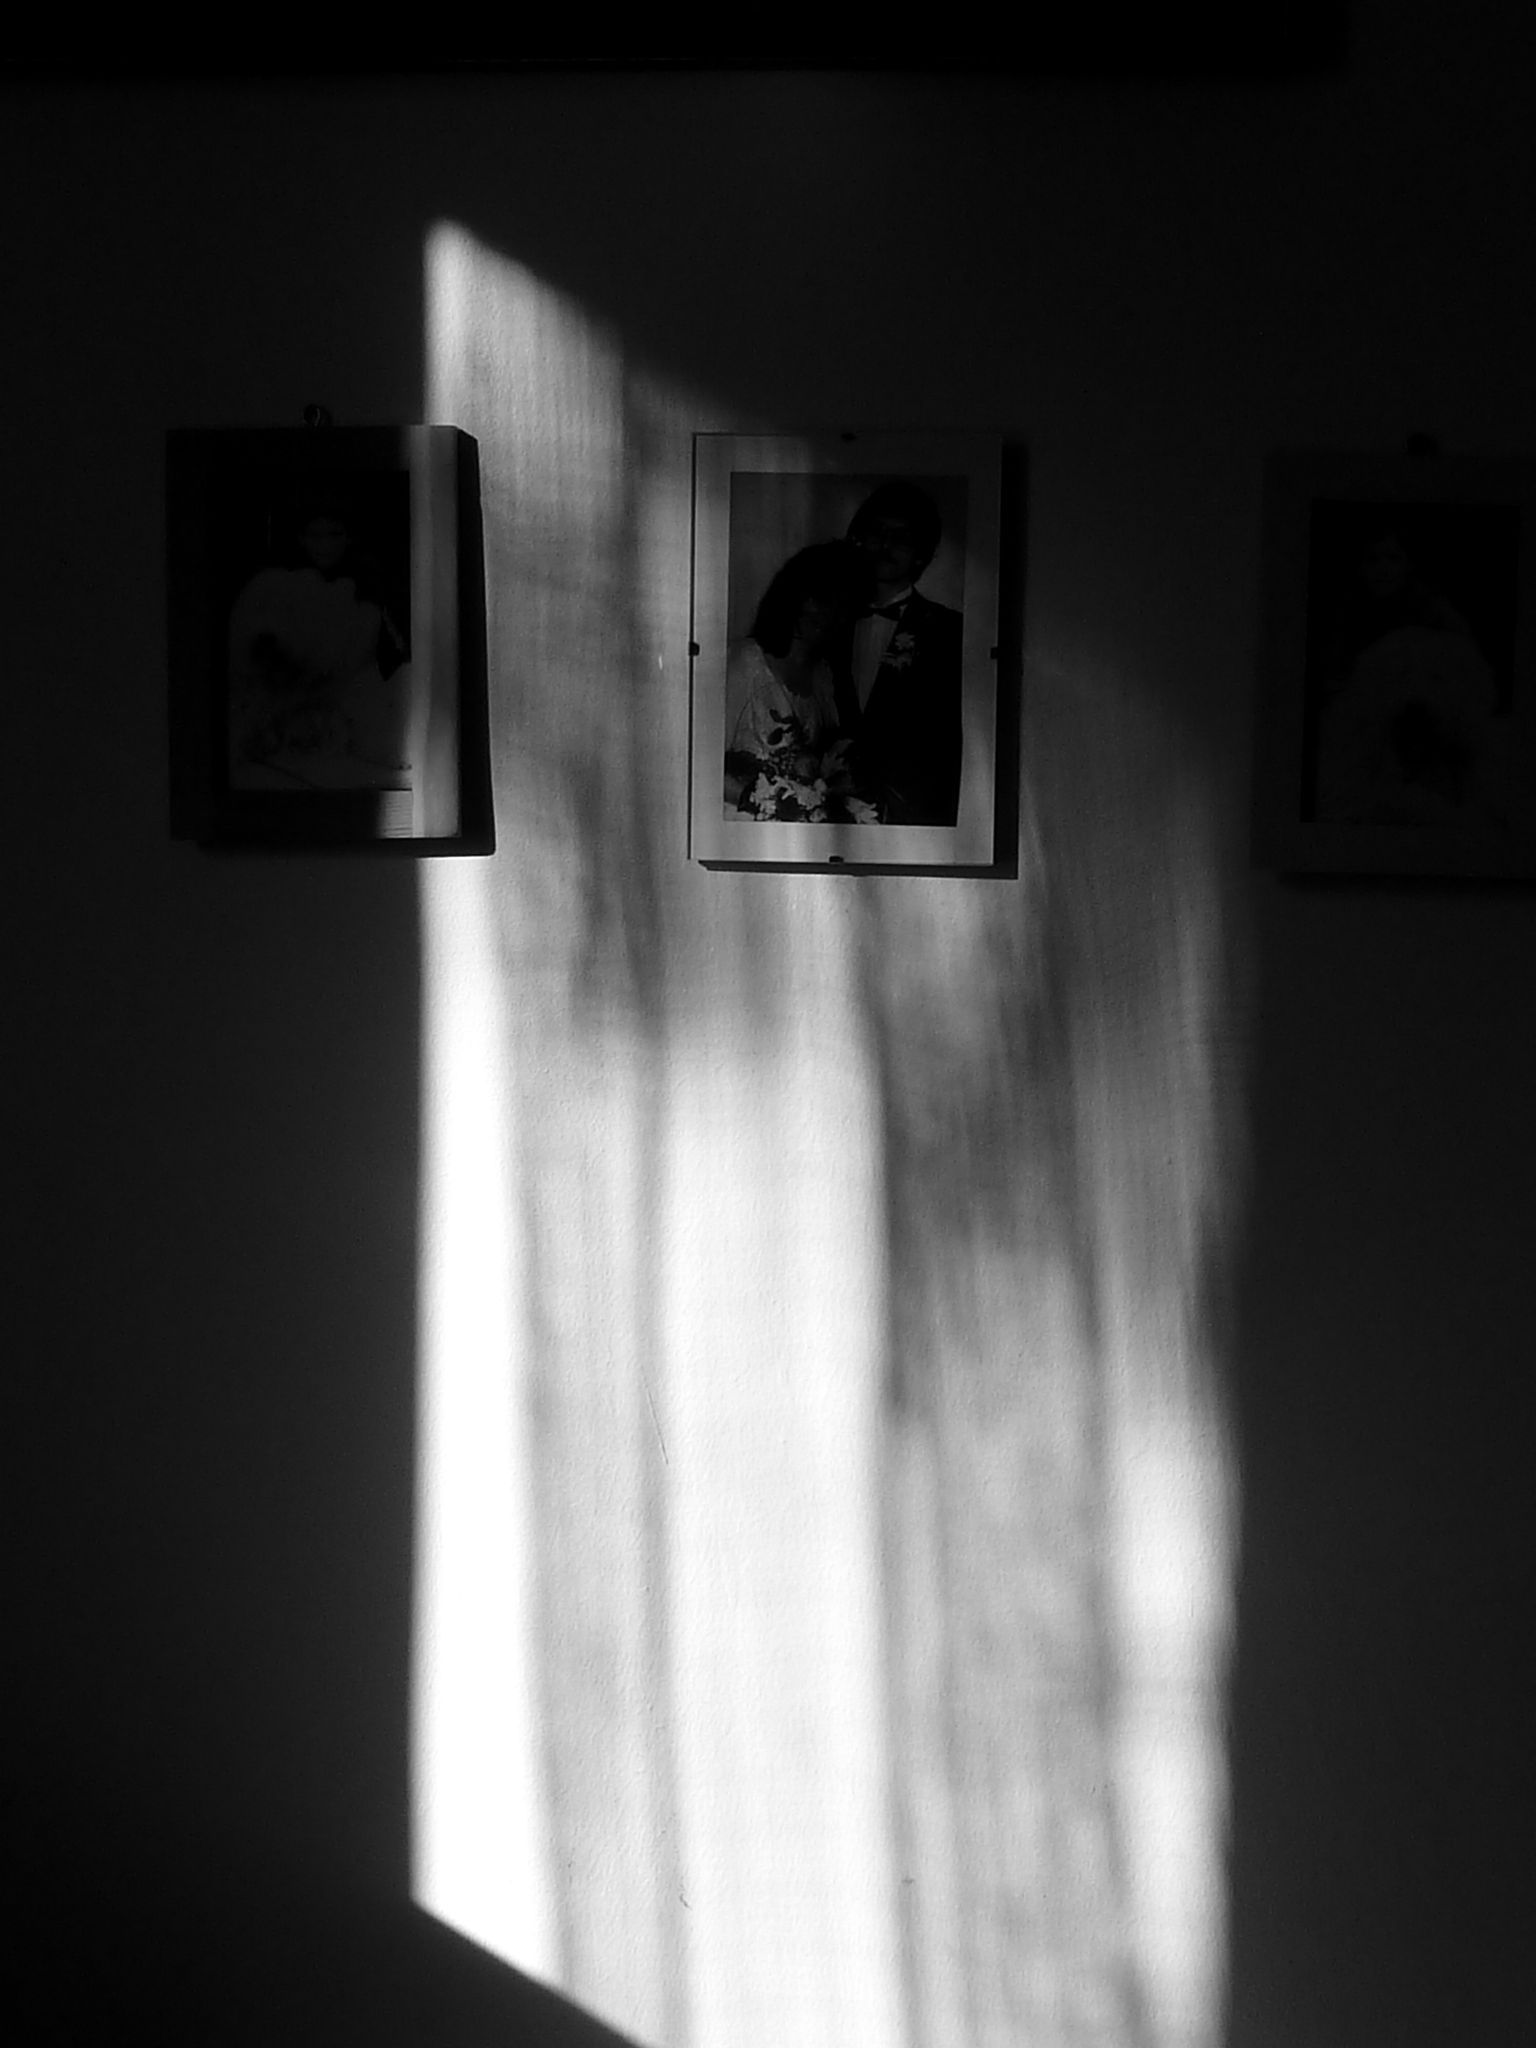 Untitled by szabo.szilvi1